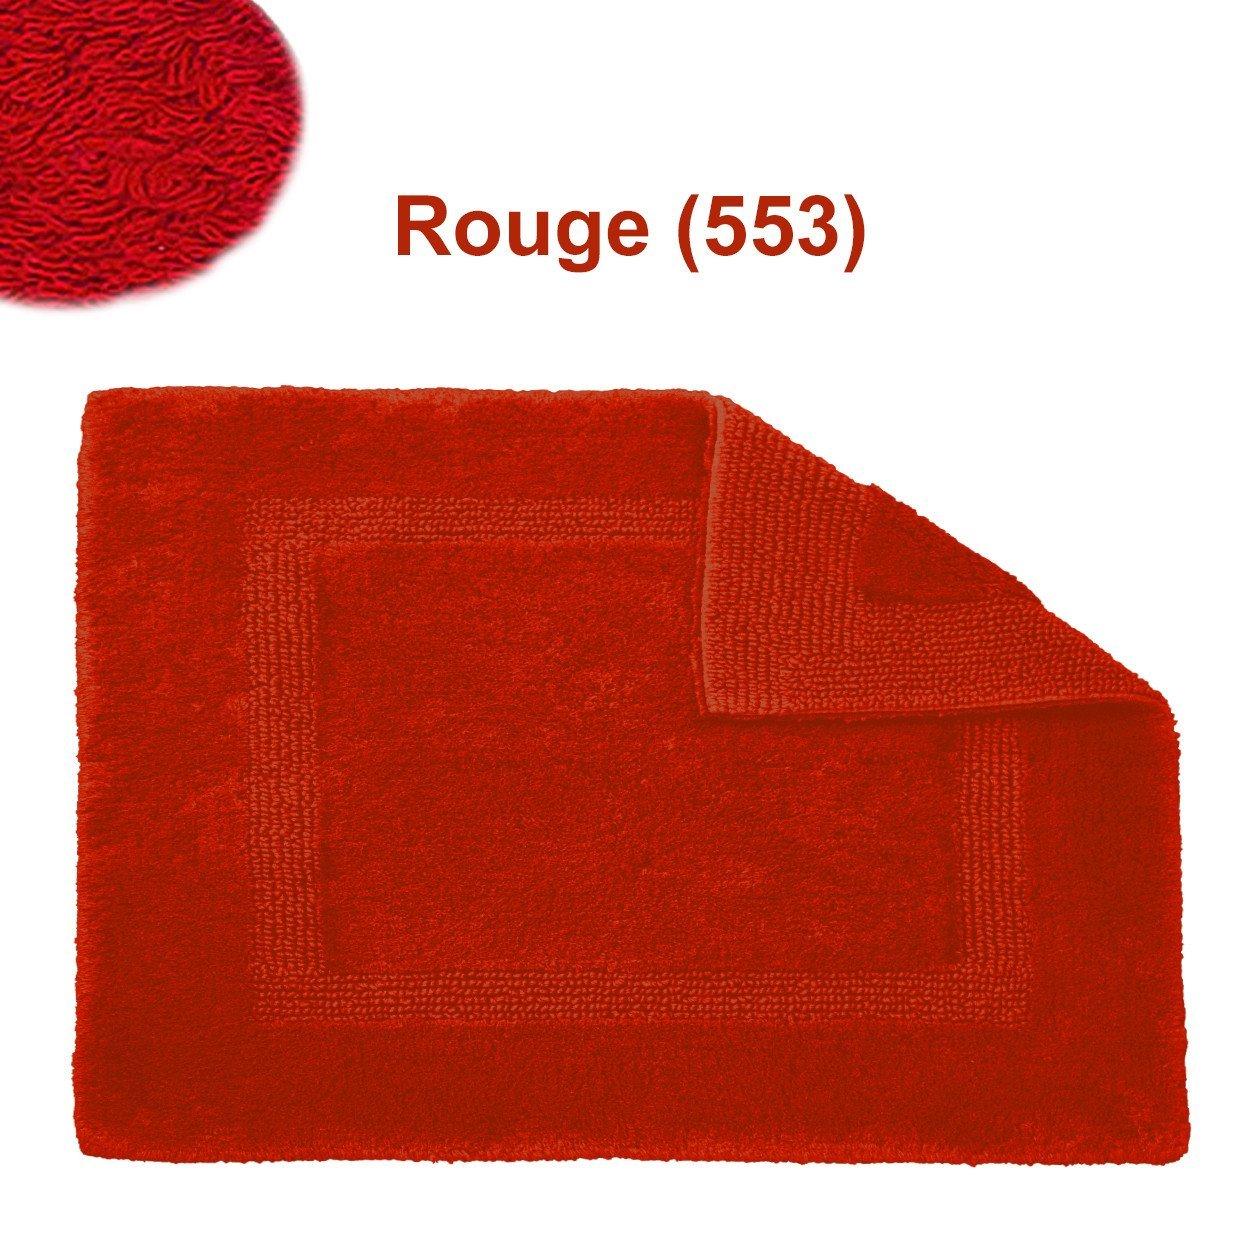 Abyss & Habidecor.- Alfombra de baño modelo Reversible 70x120 cm Rouge 553